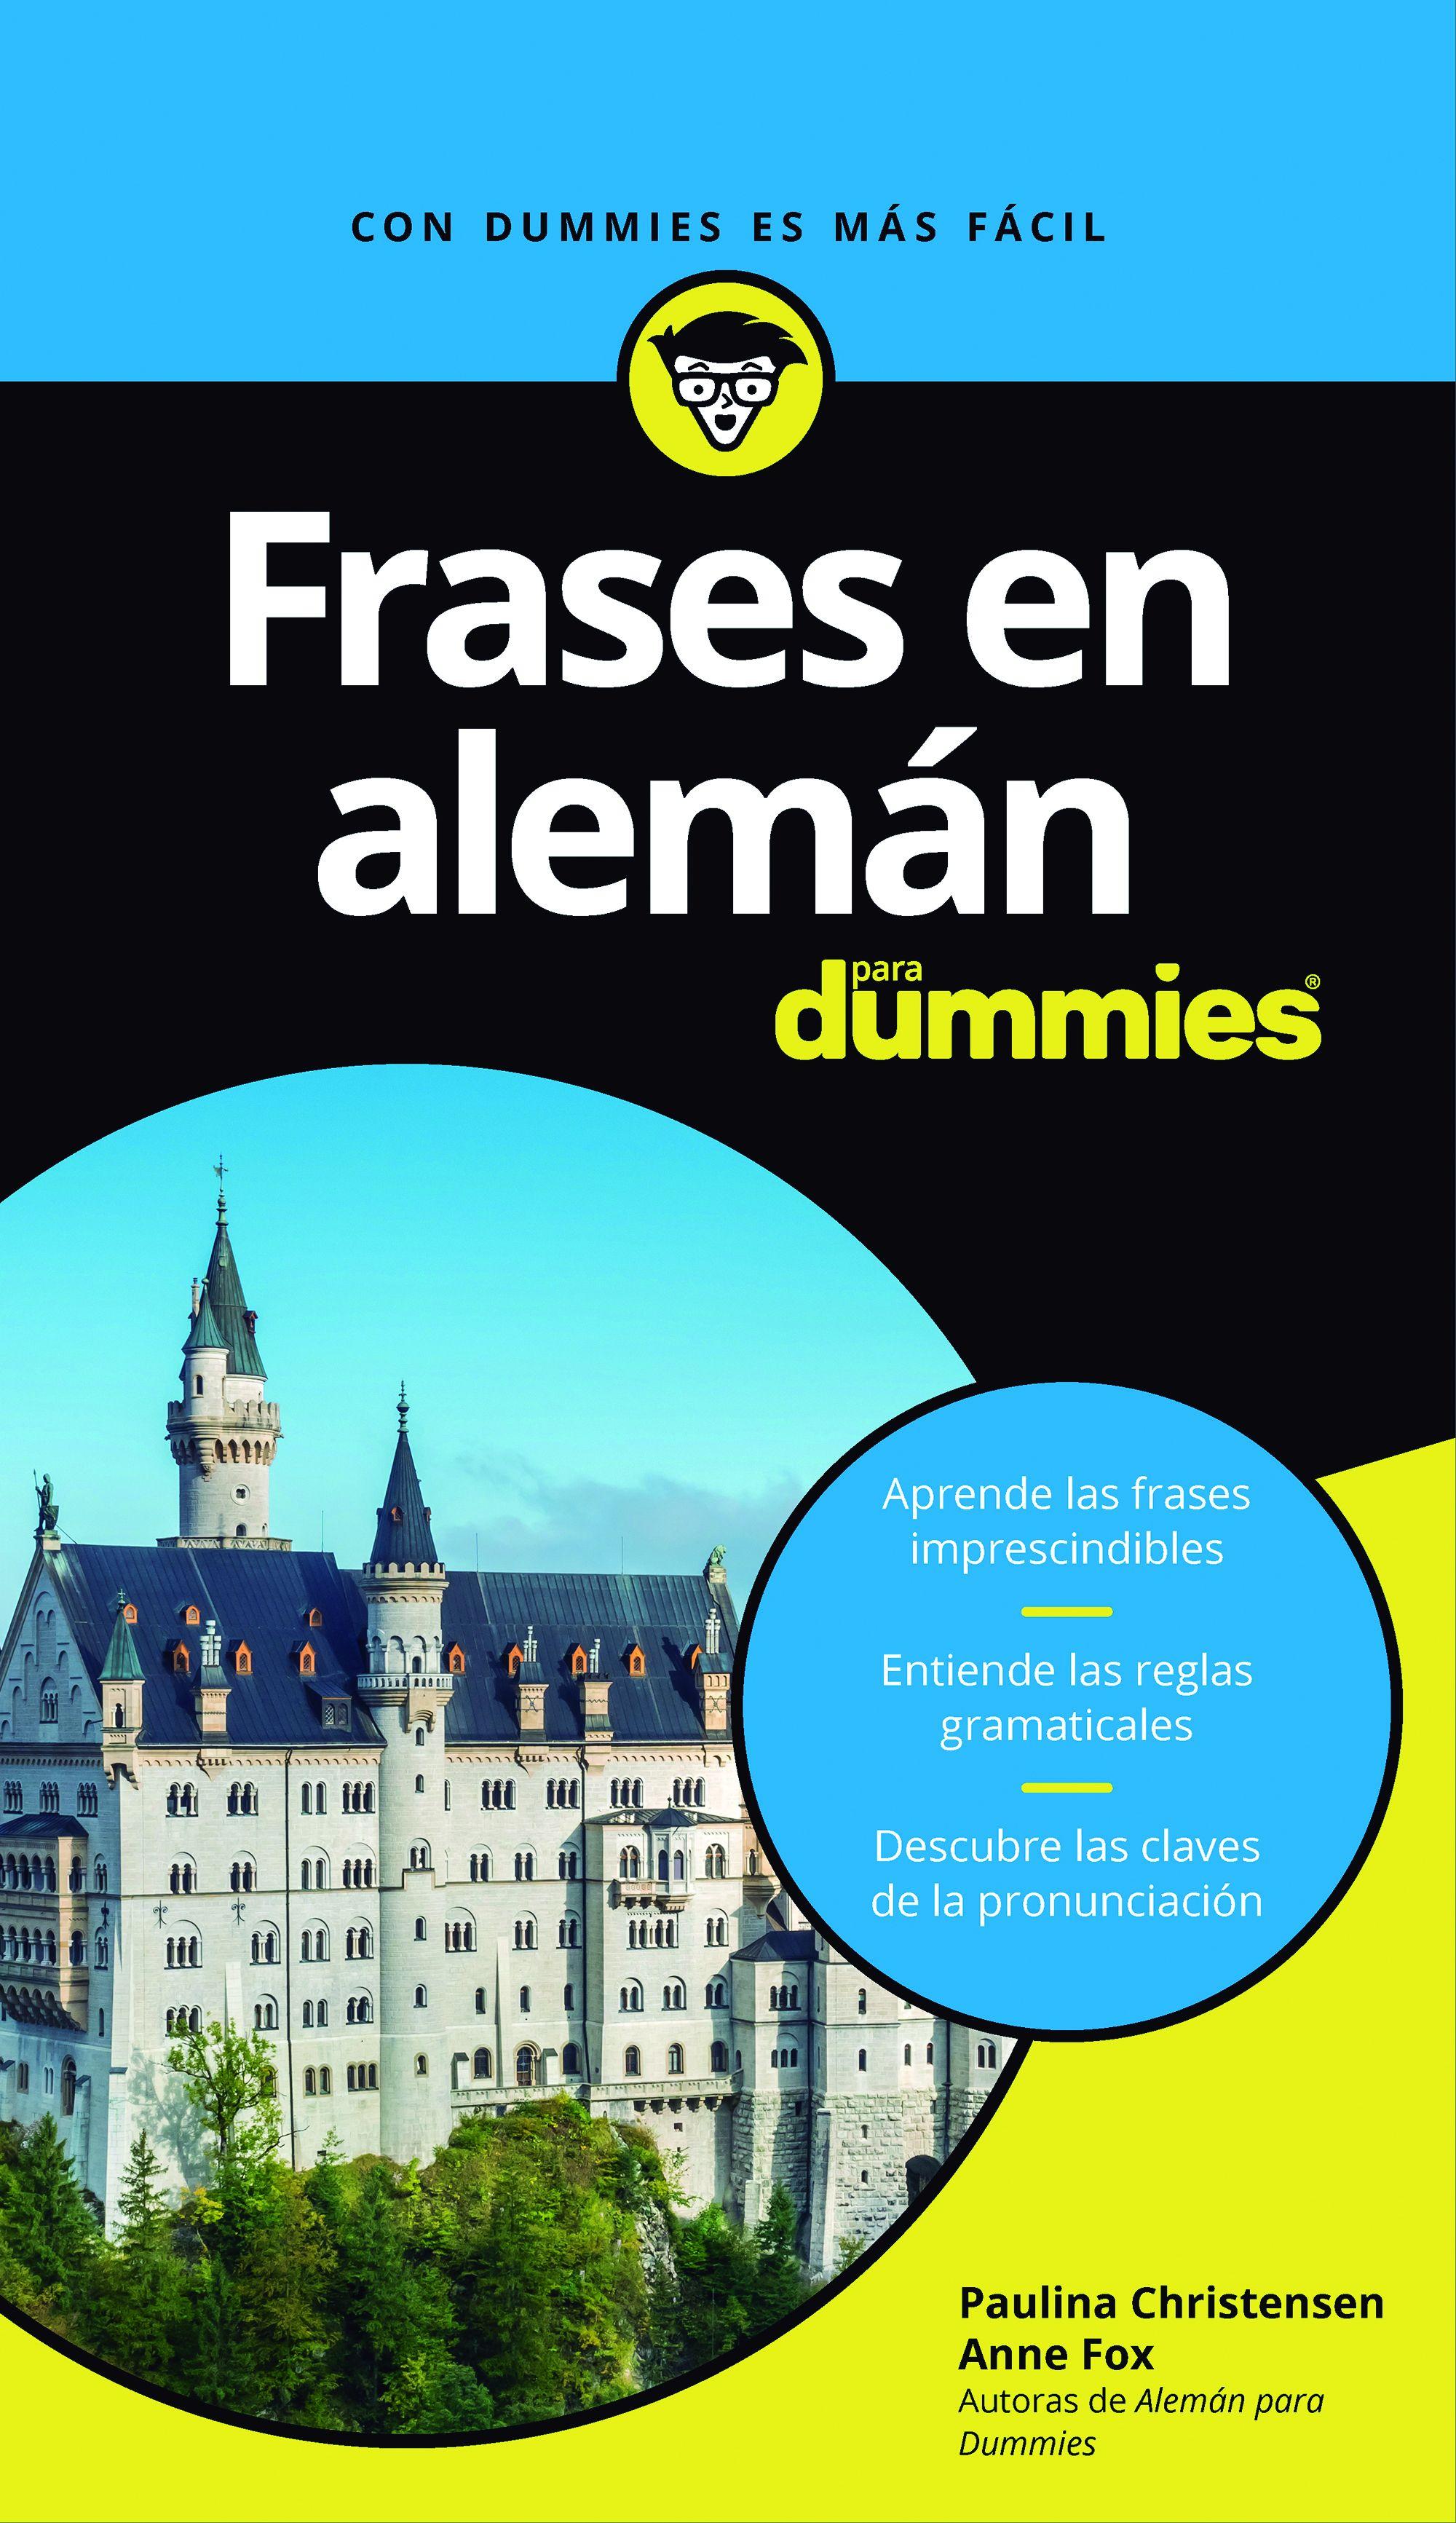 Frases en Alemán Para Dummies - Paulina Christensen,Anne Fox - Para Dummies Colombia